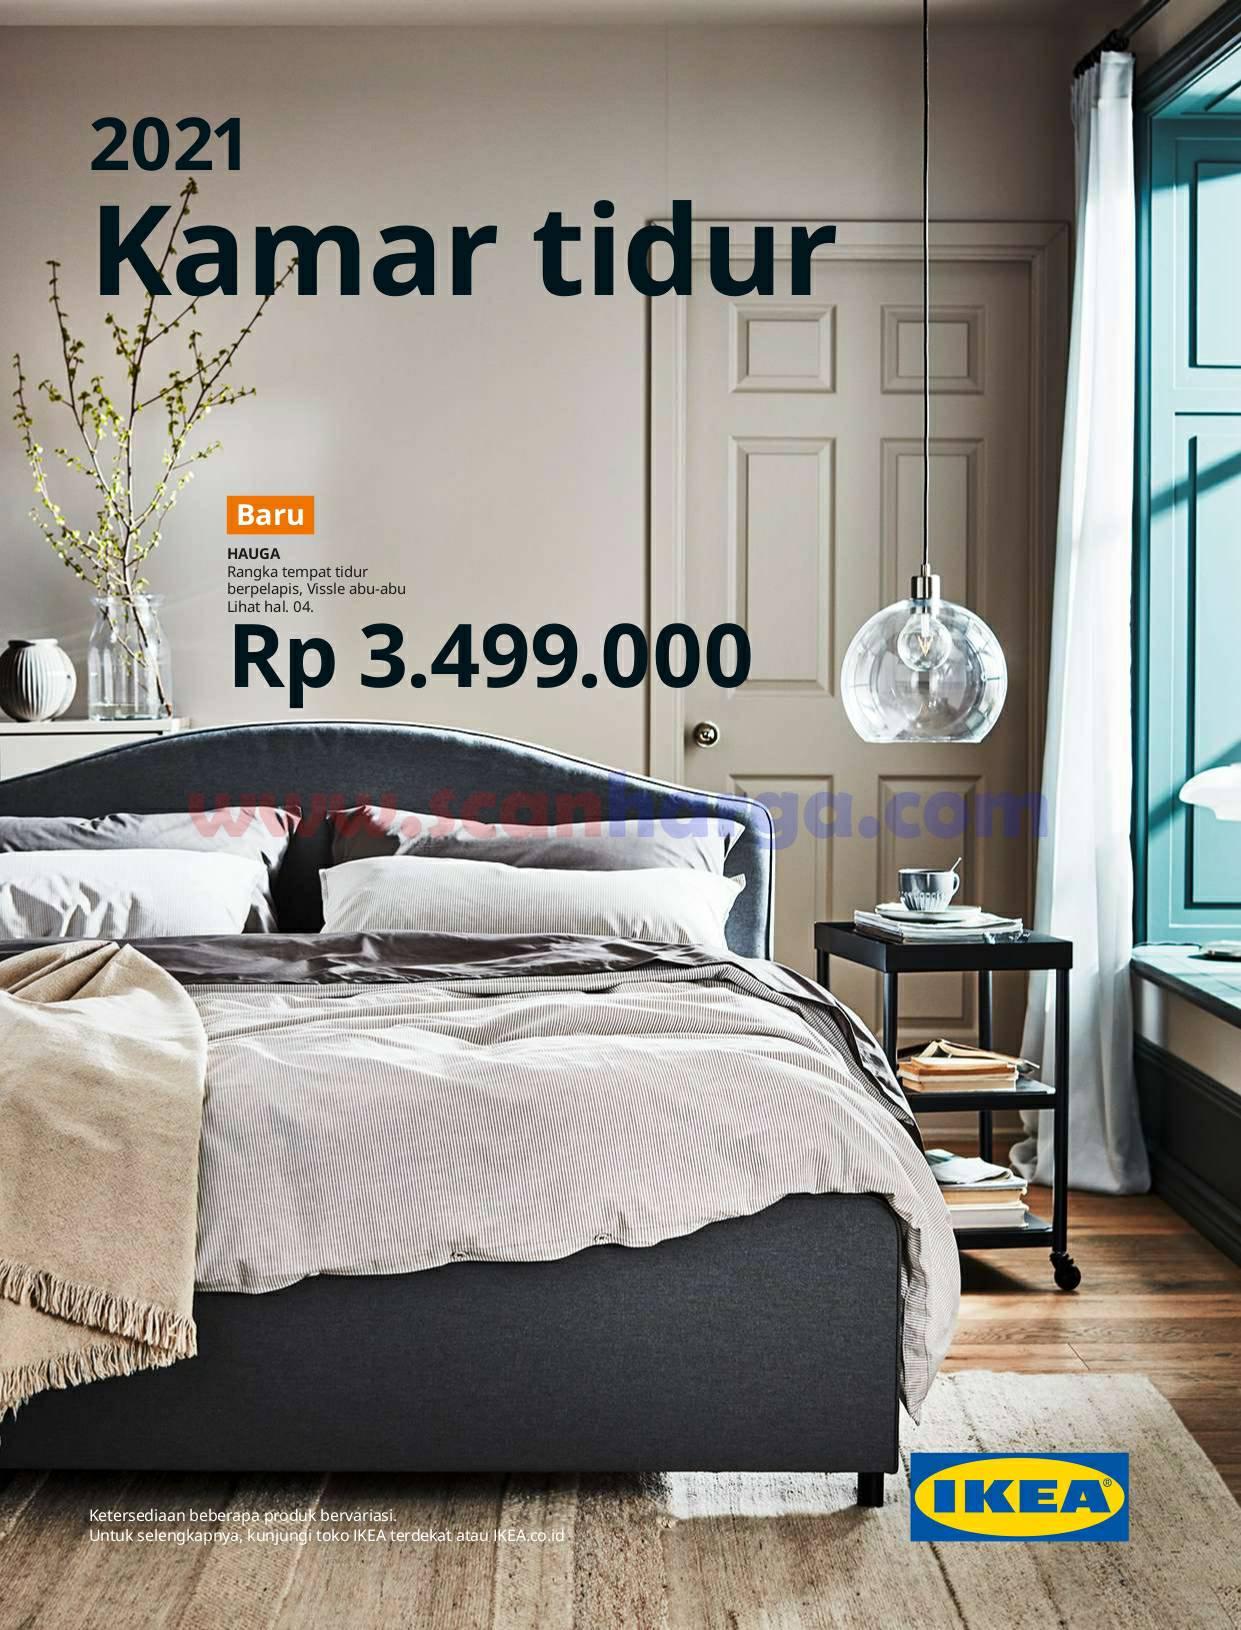 Katalog Harga IKEA Terbaru Katalog IKEA 2021 - 3